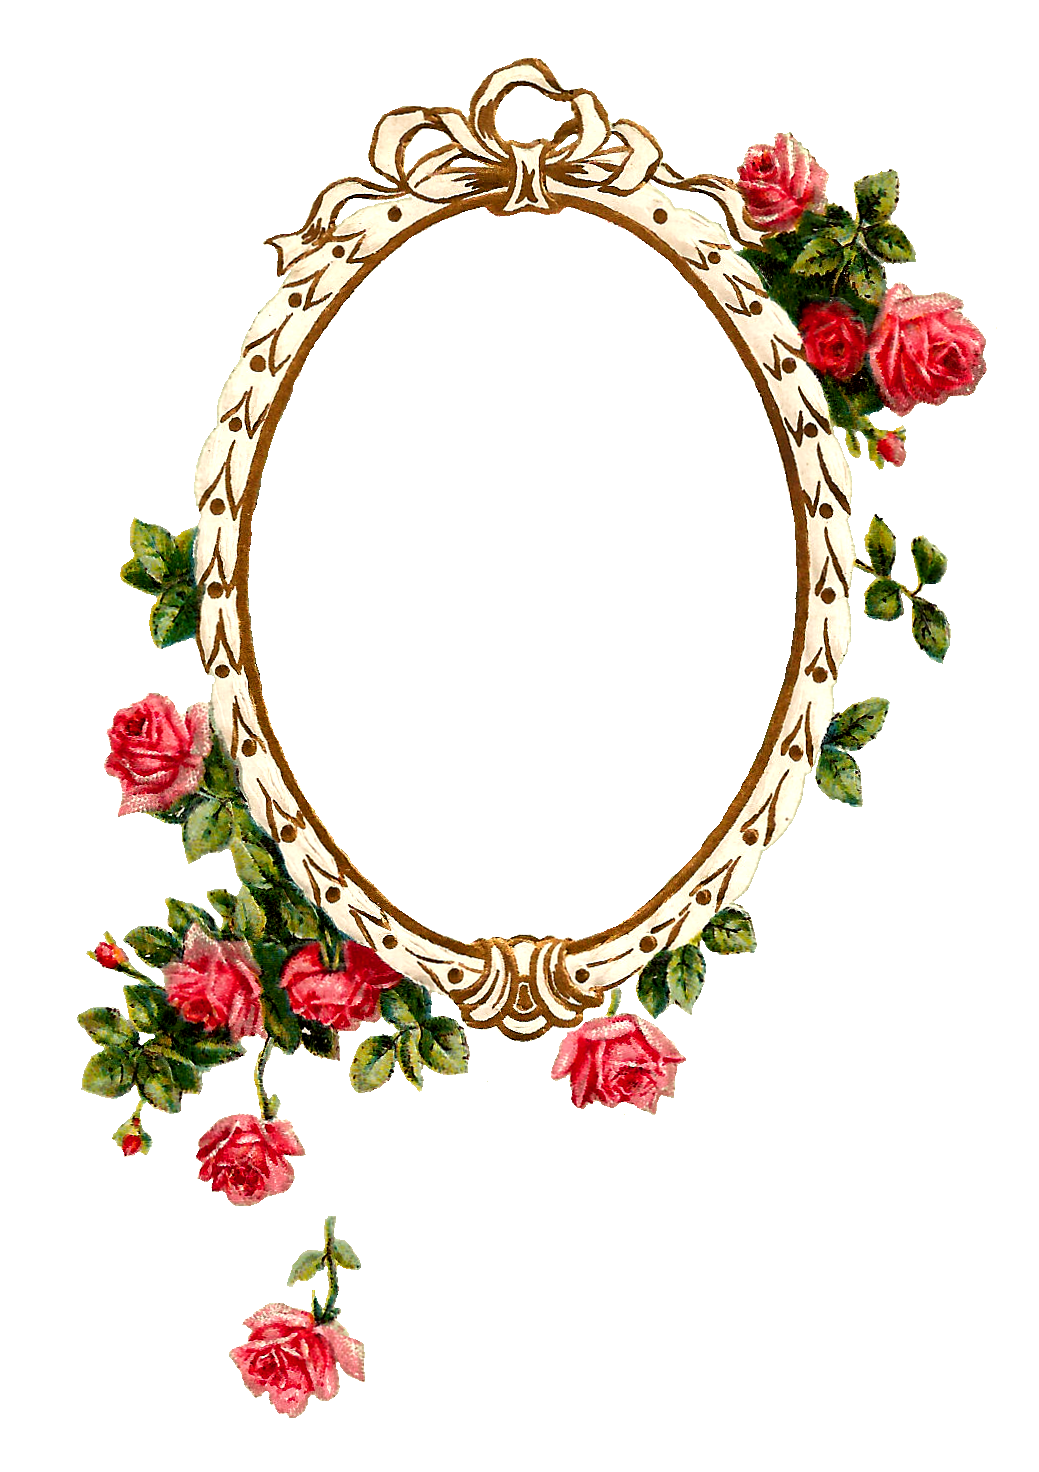 R clipart rose. Antique images free digital